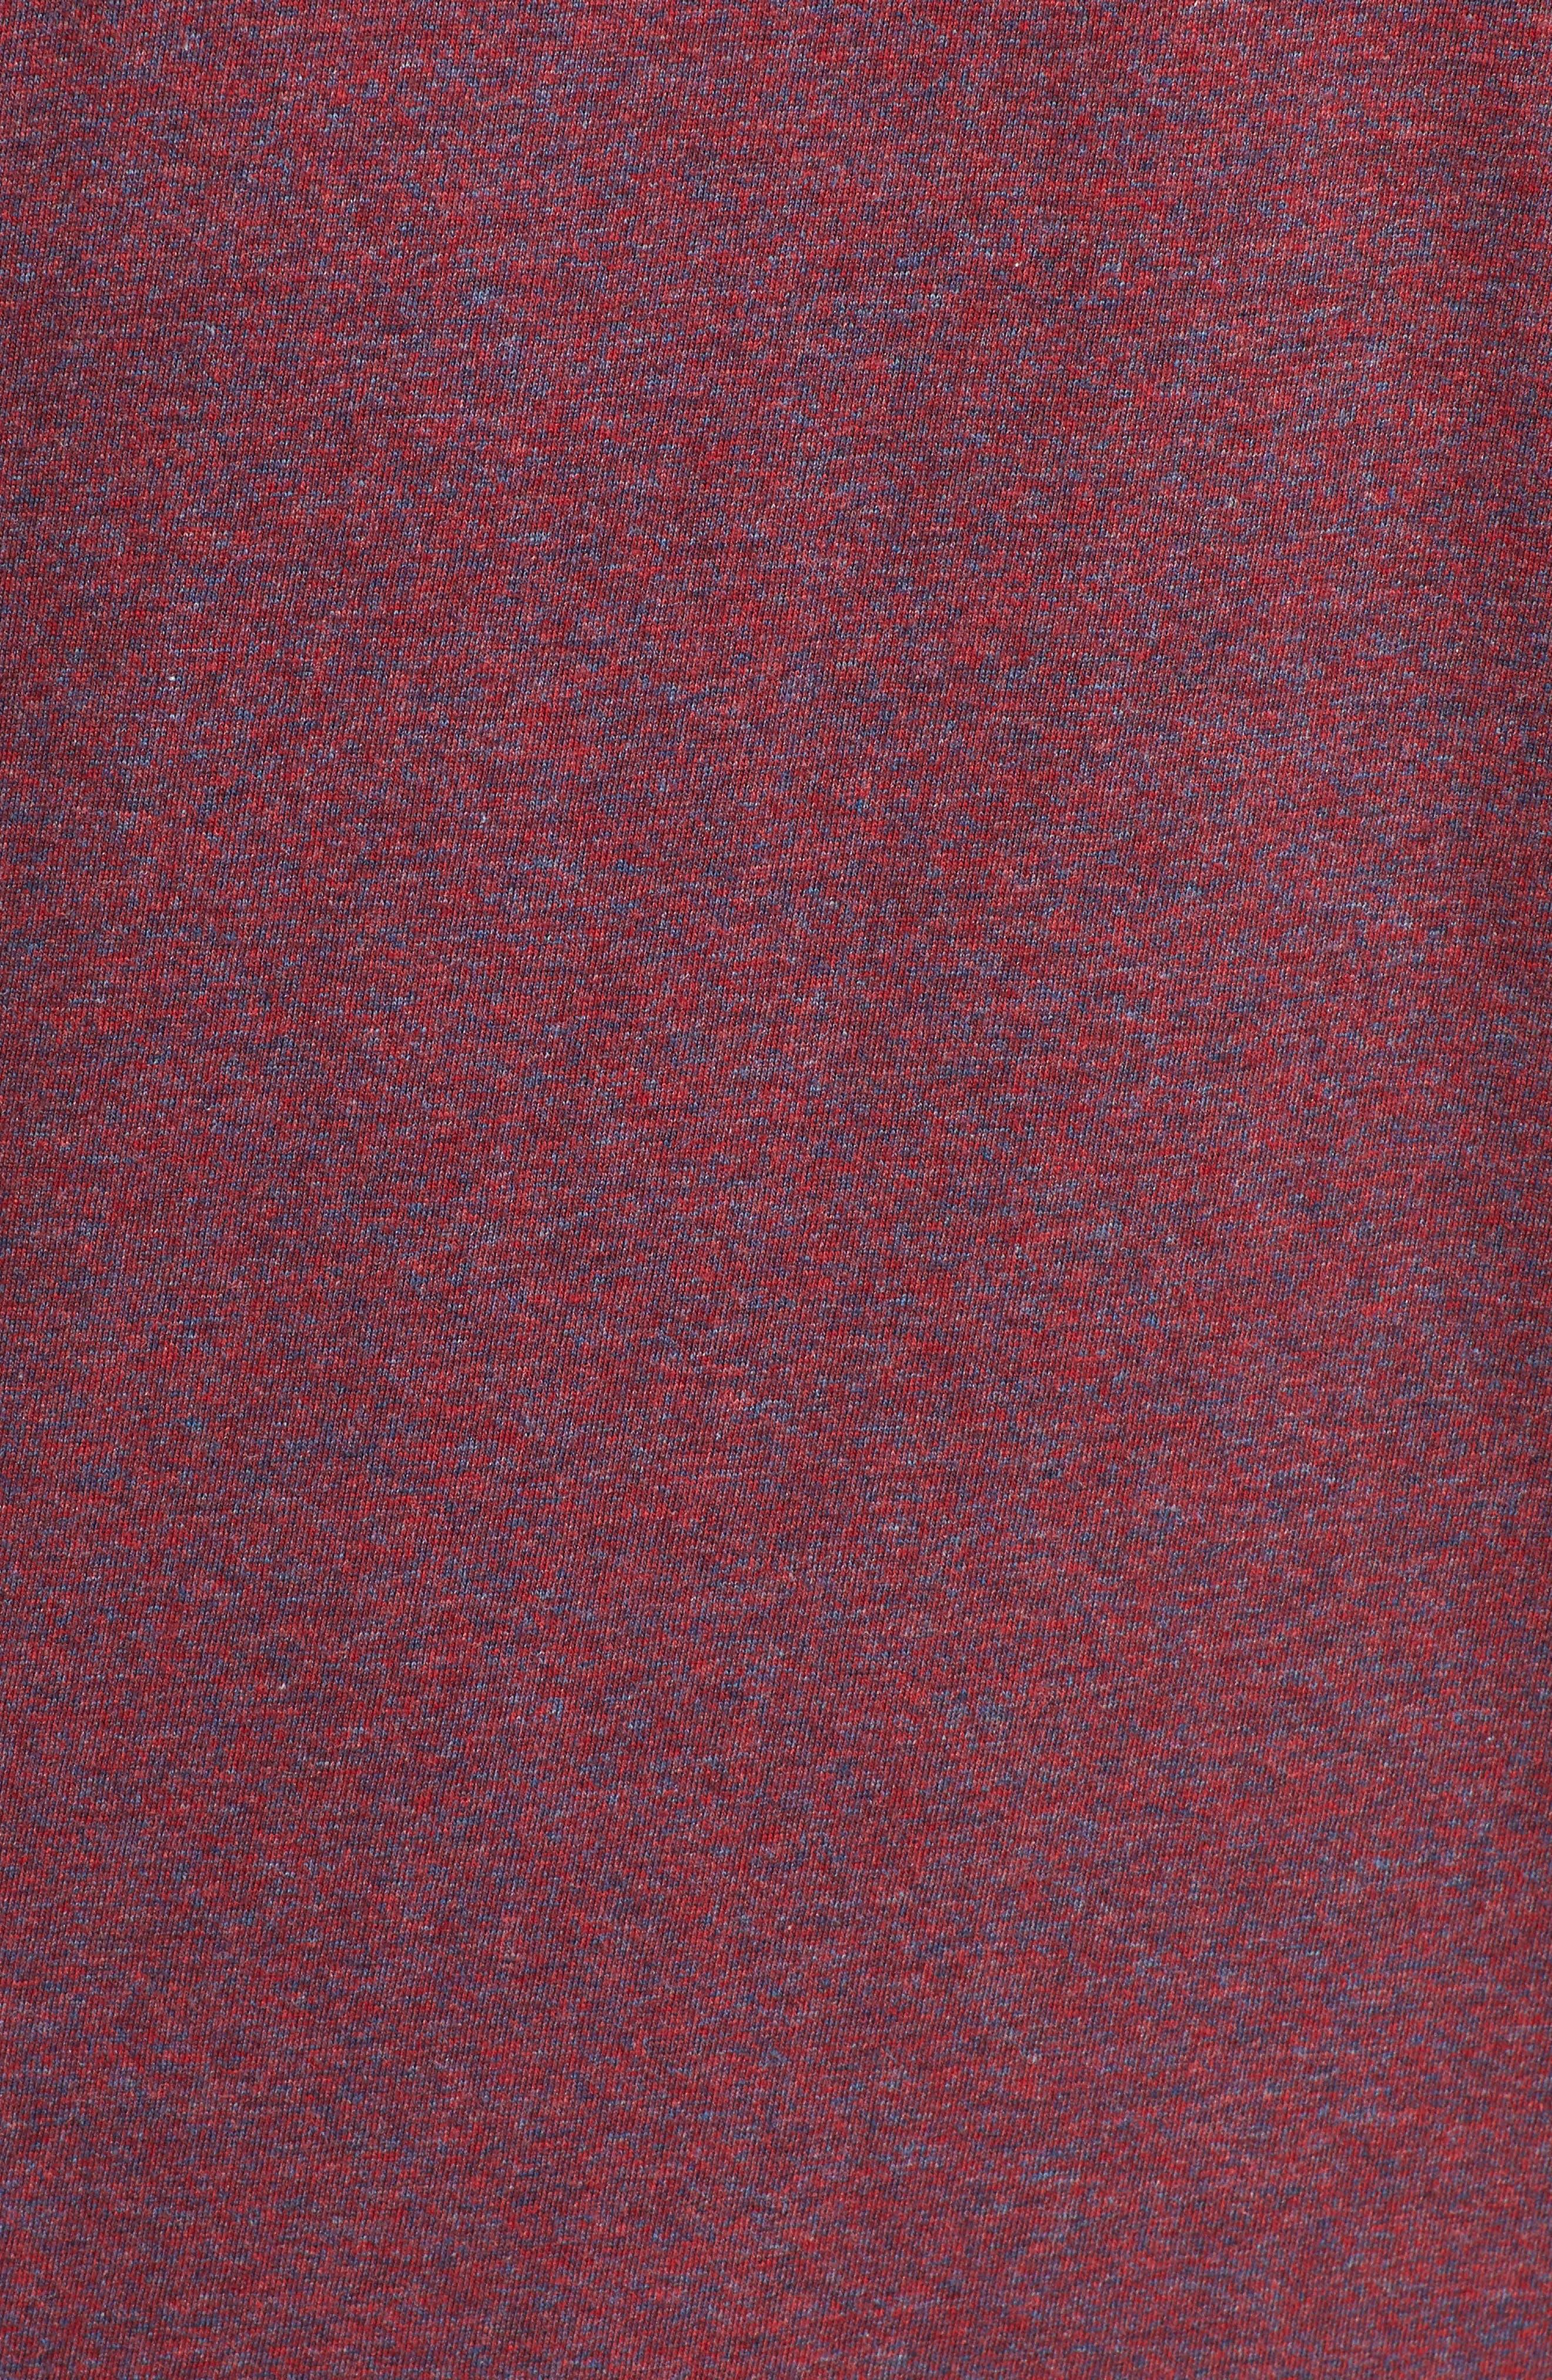 Cobb Raglan T-Shirt,                             Alternate thumbnail 5, color,                             BURGUNDY SALT PEPPER